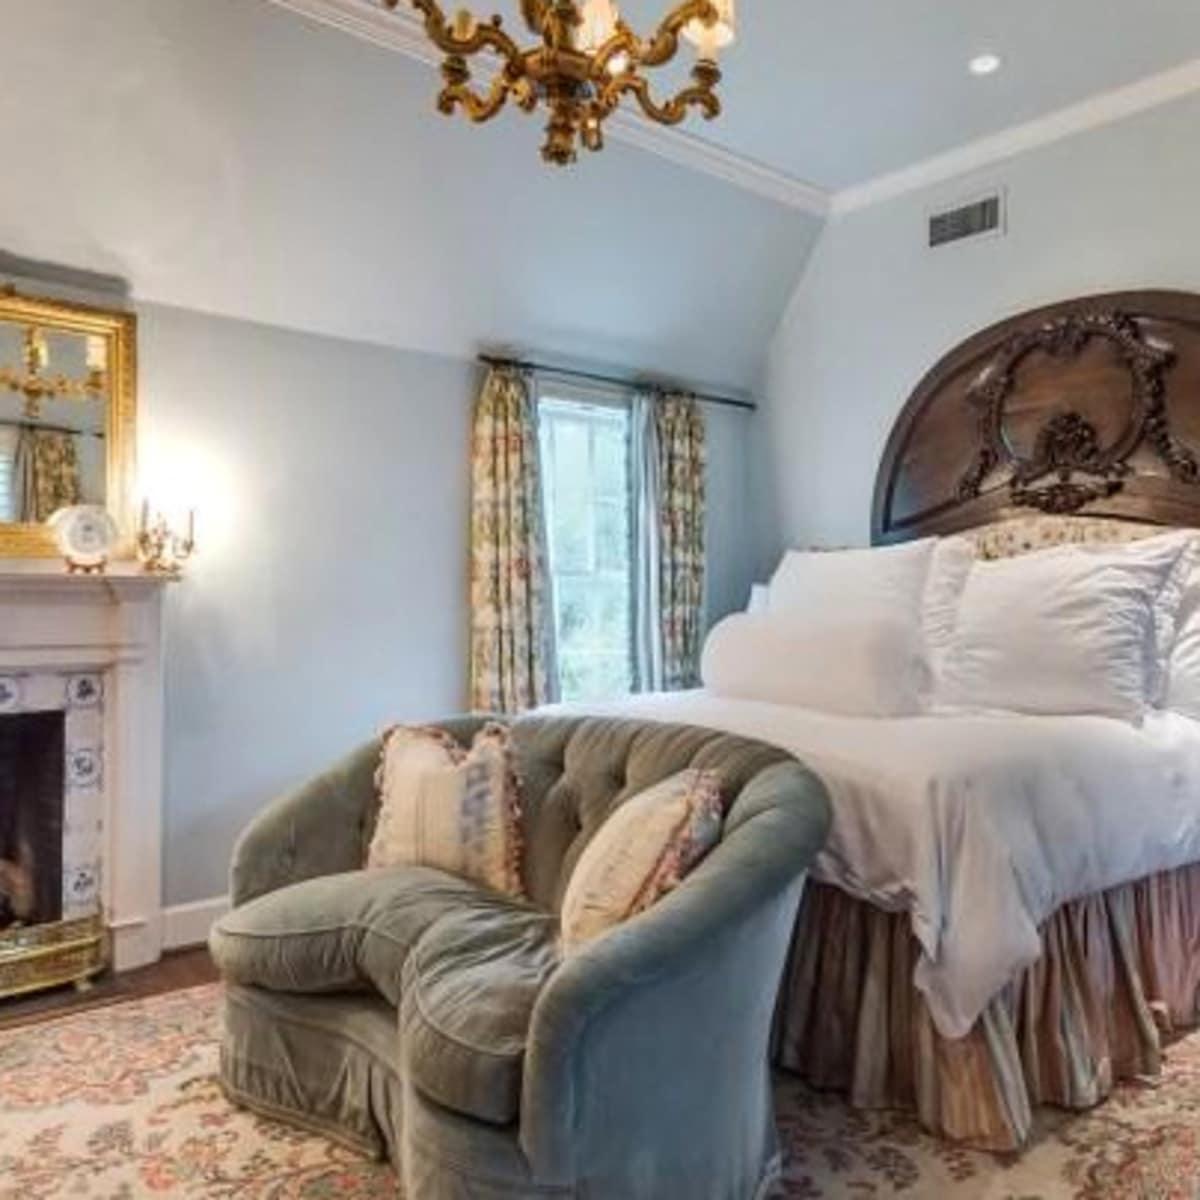 Houston, real estate, August 2017, George R. Brown's River Oaks Mansion, 3363 Inwood Dr, bedroom